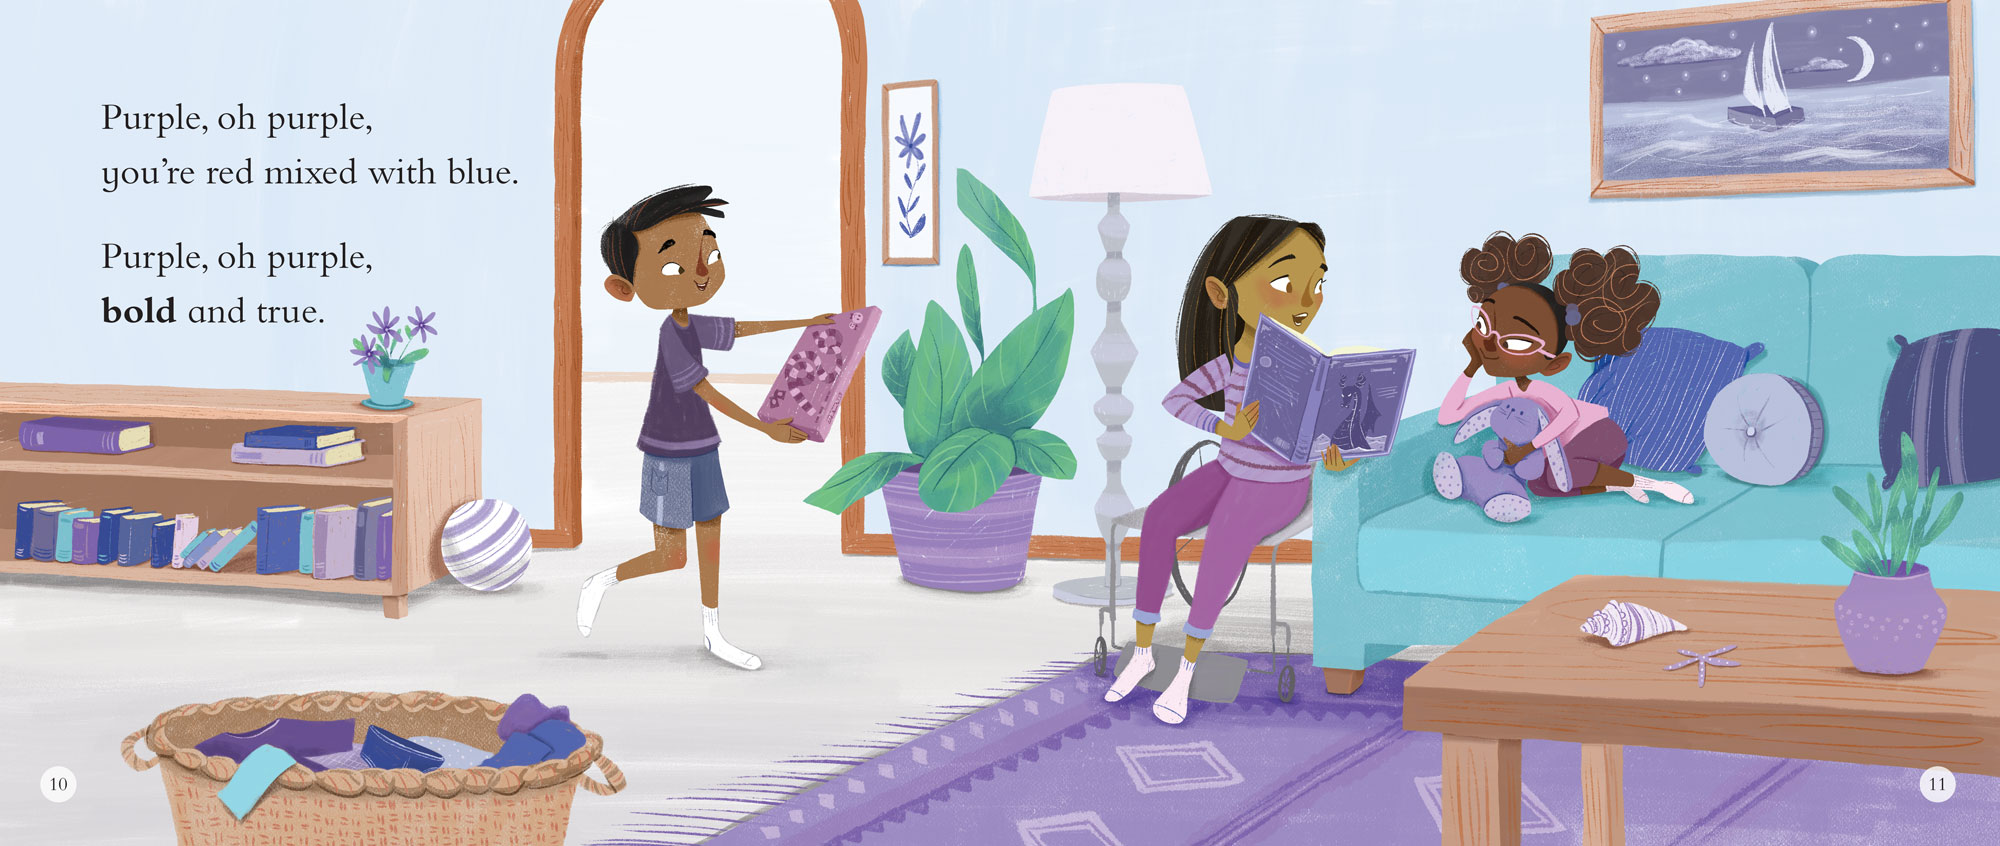 purple-10-11.jpg